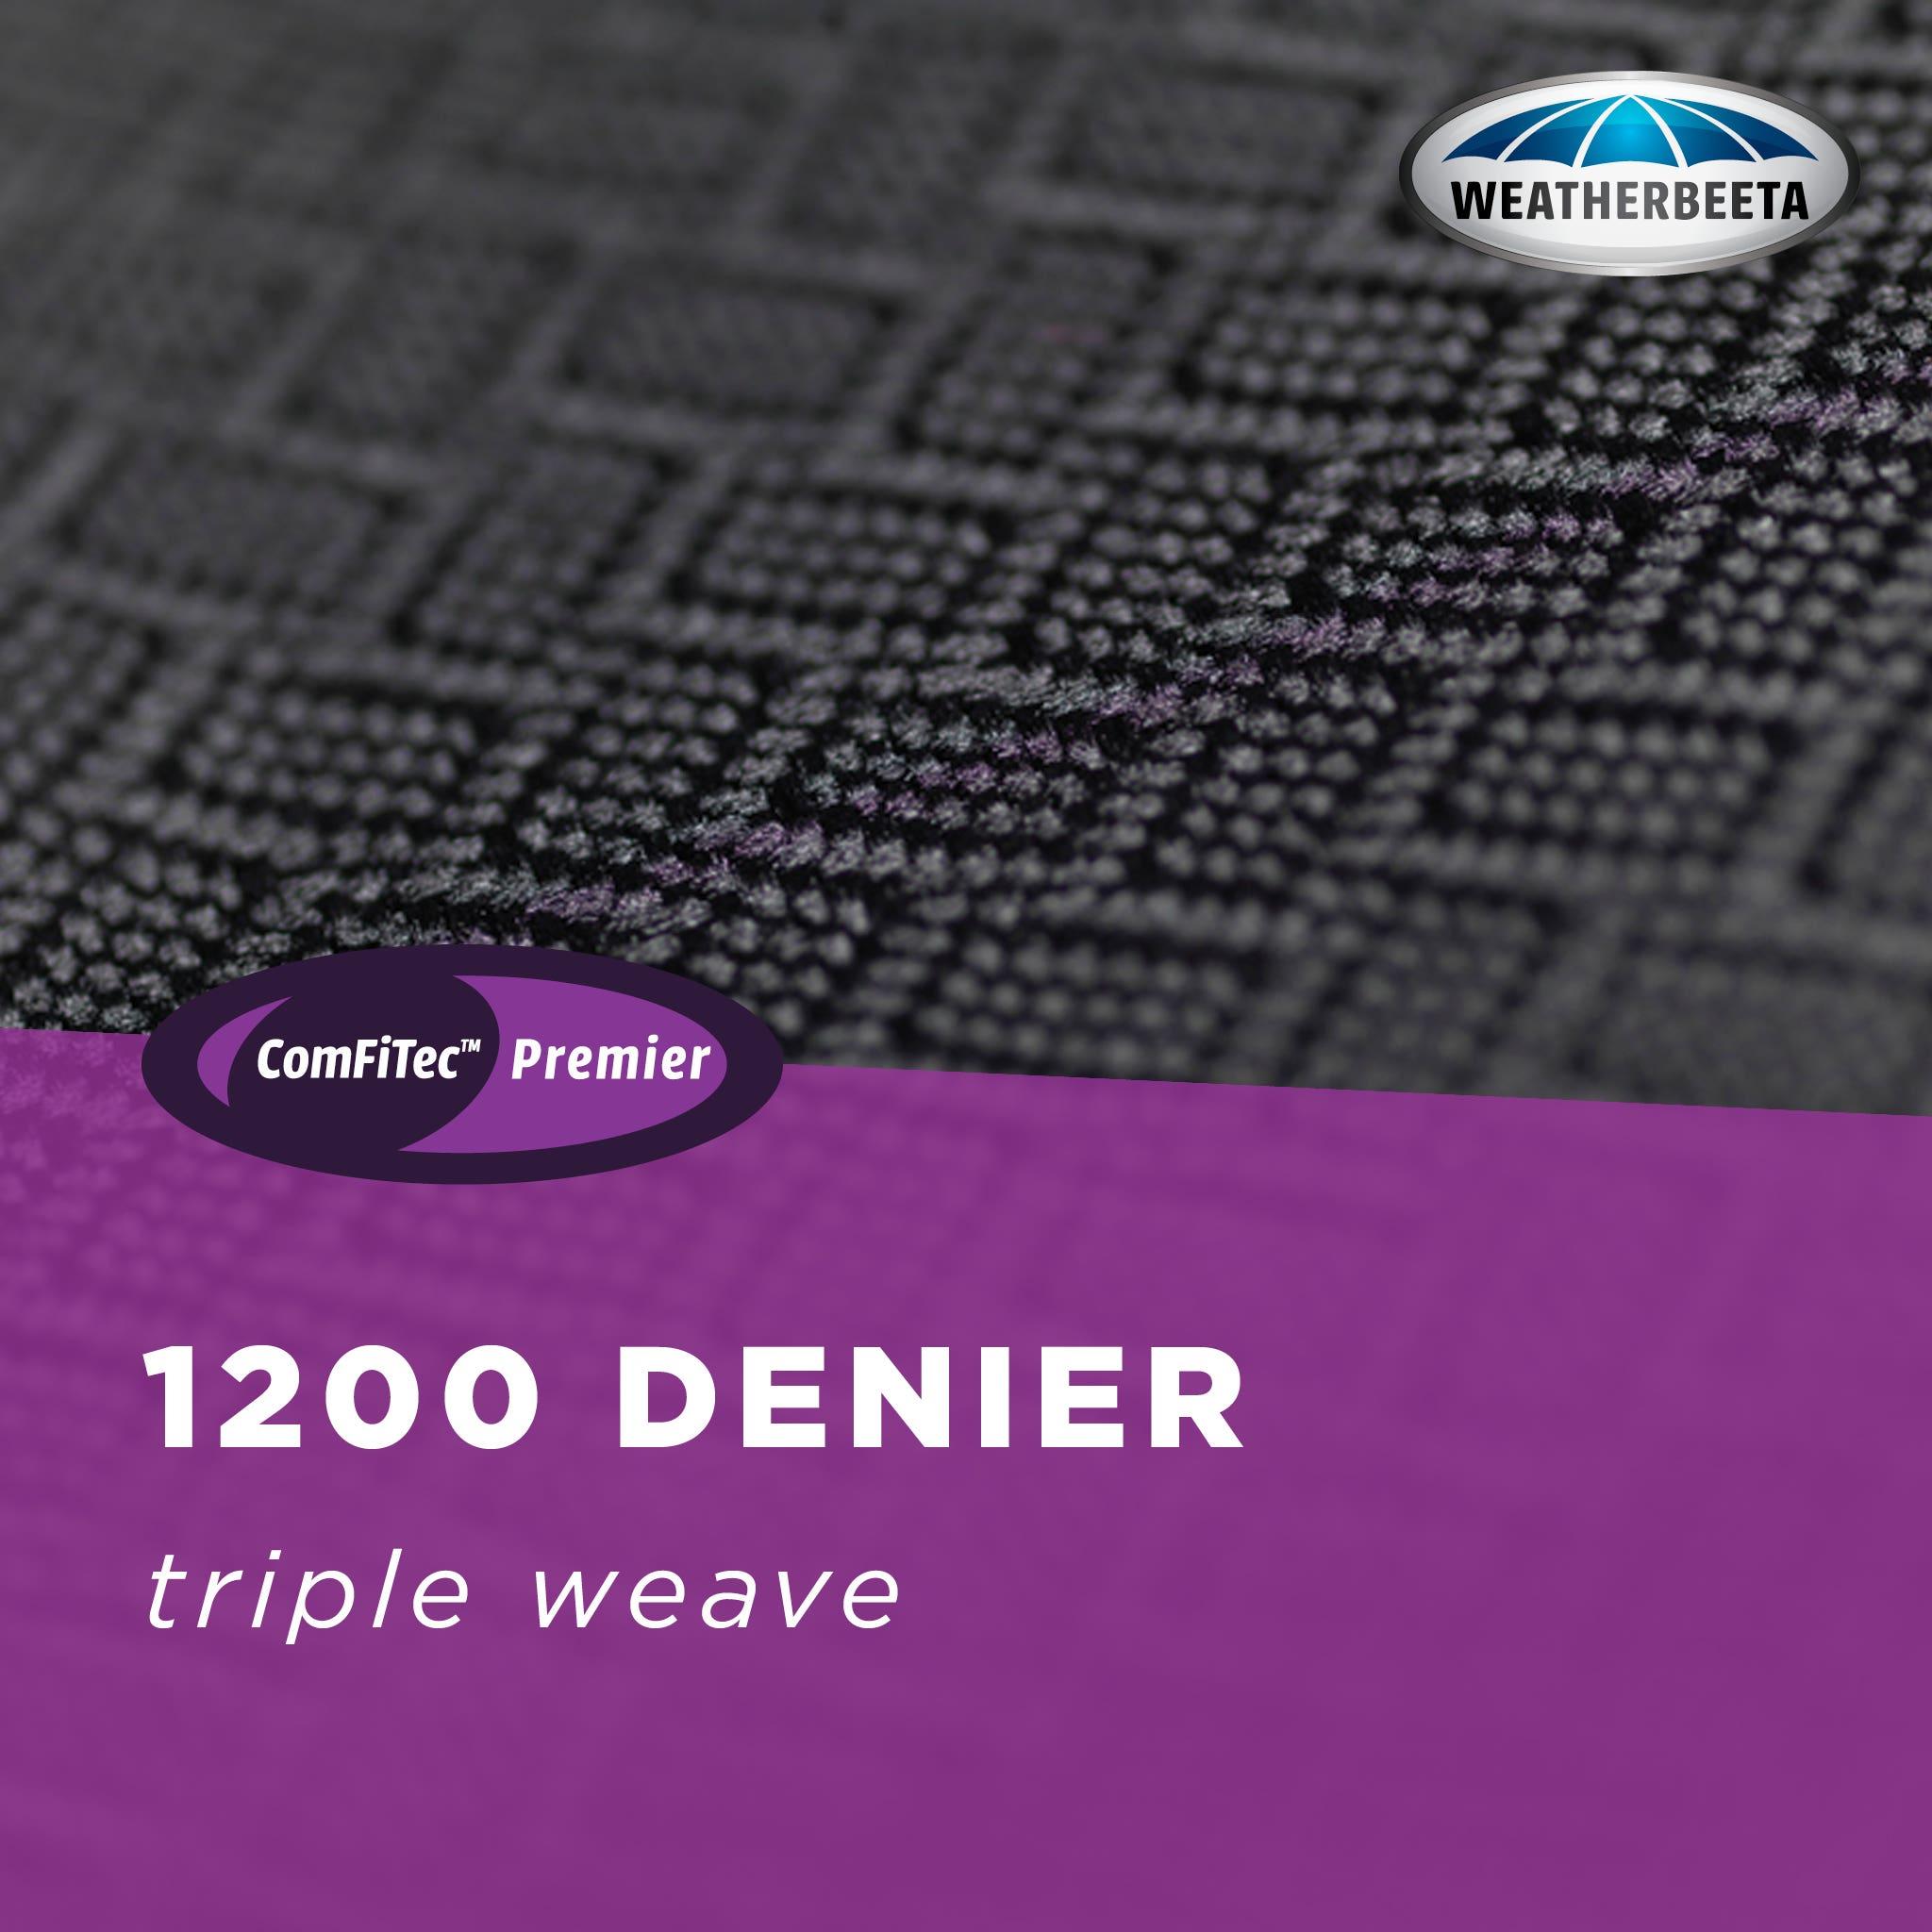 ComFiTec Premier 1200 Denier